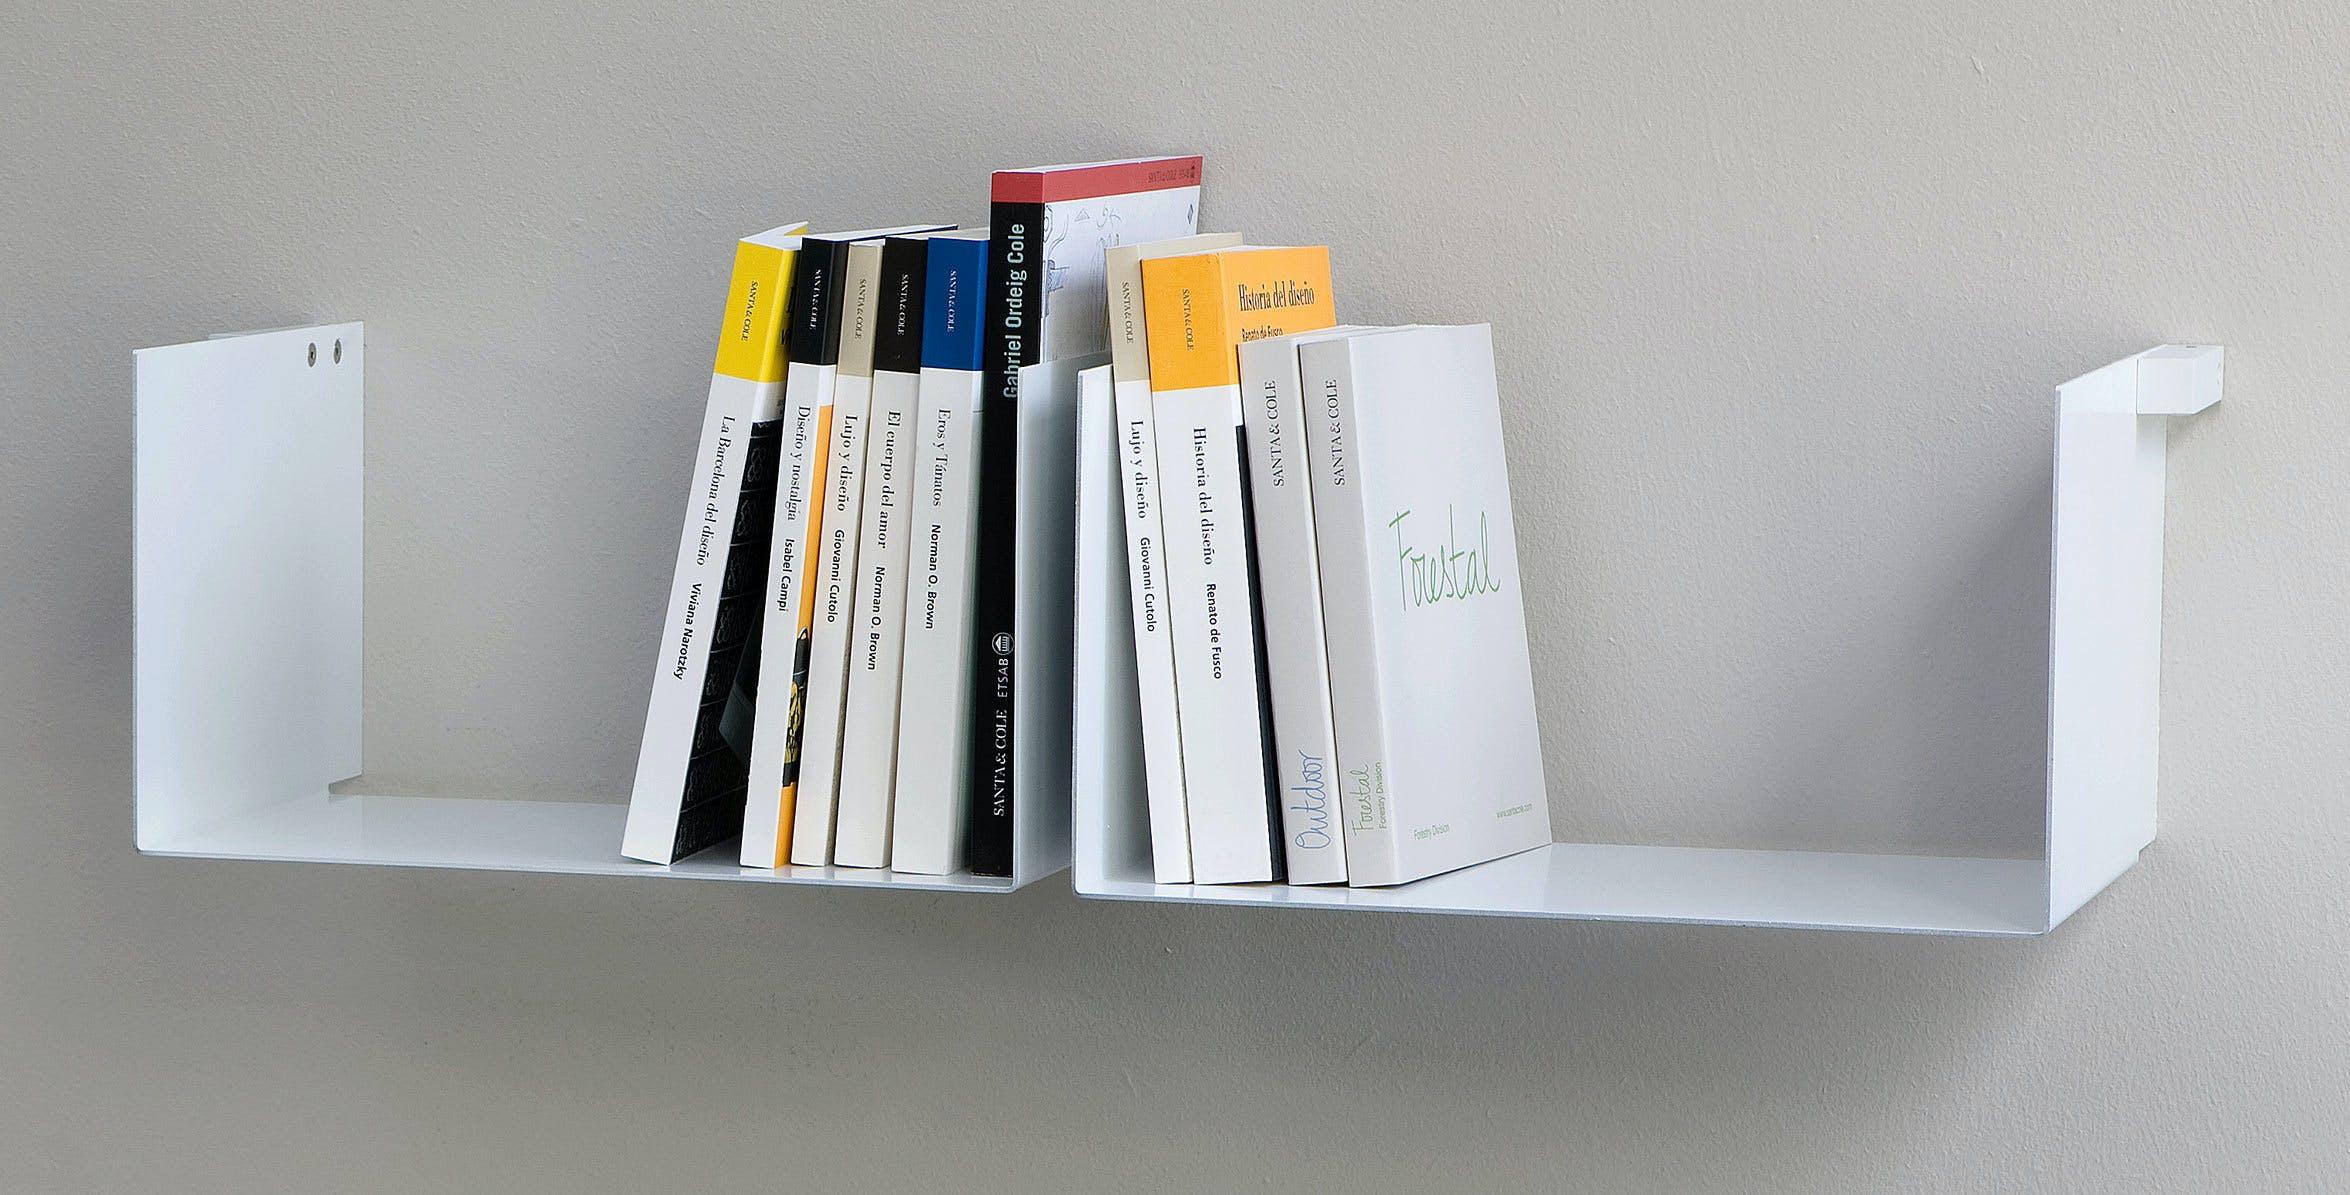 Designer Placeholder Carme Pinos